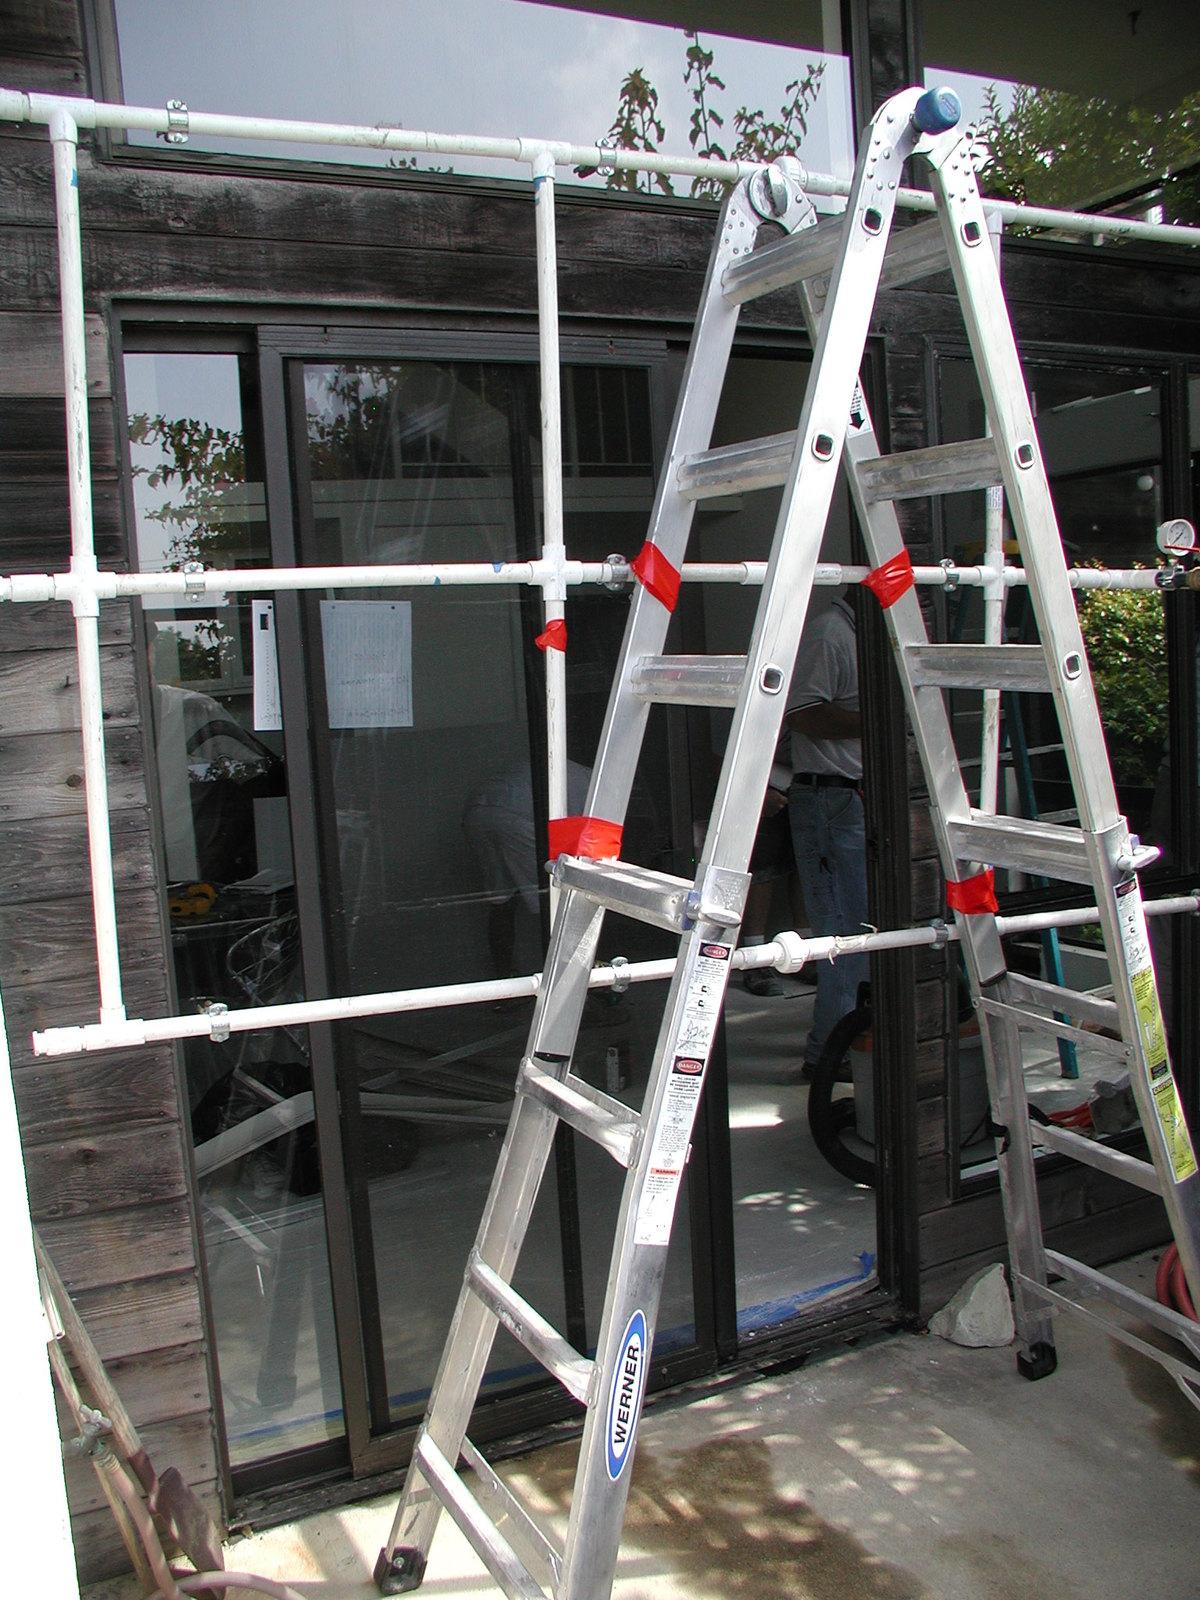 Window water-test rig.